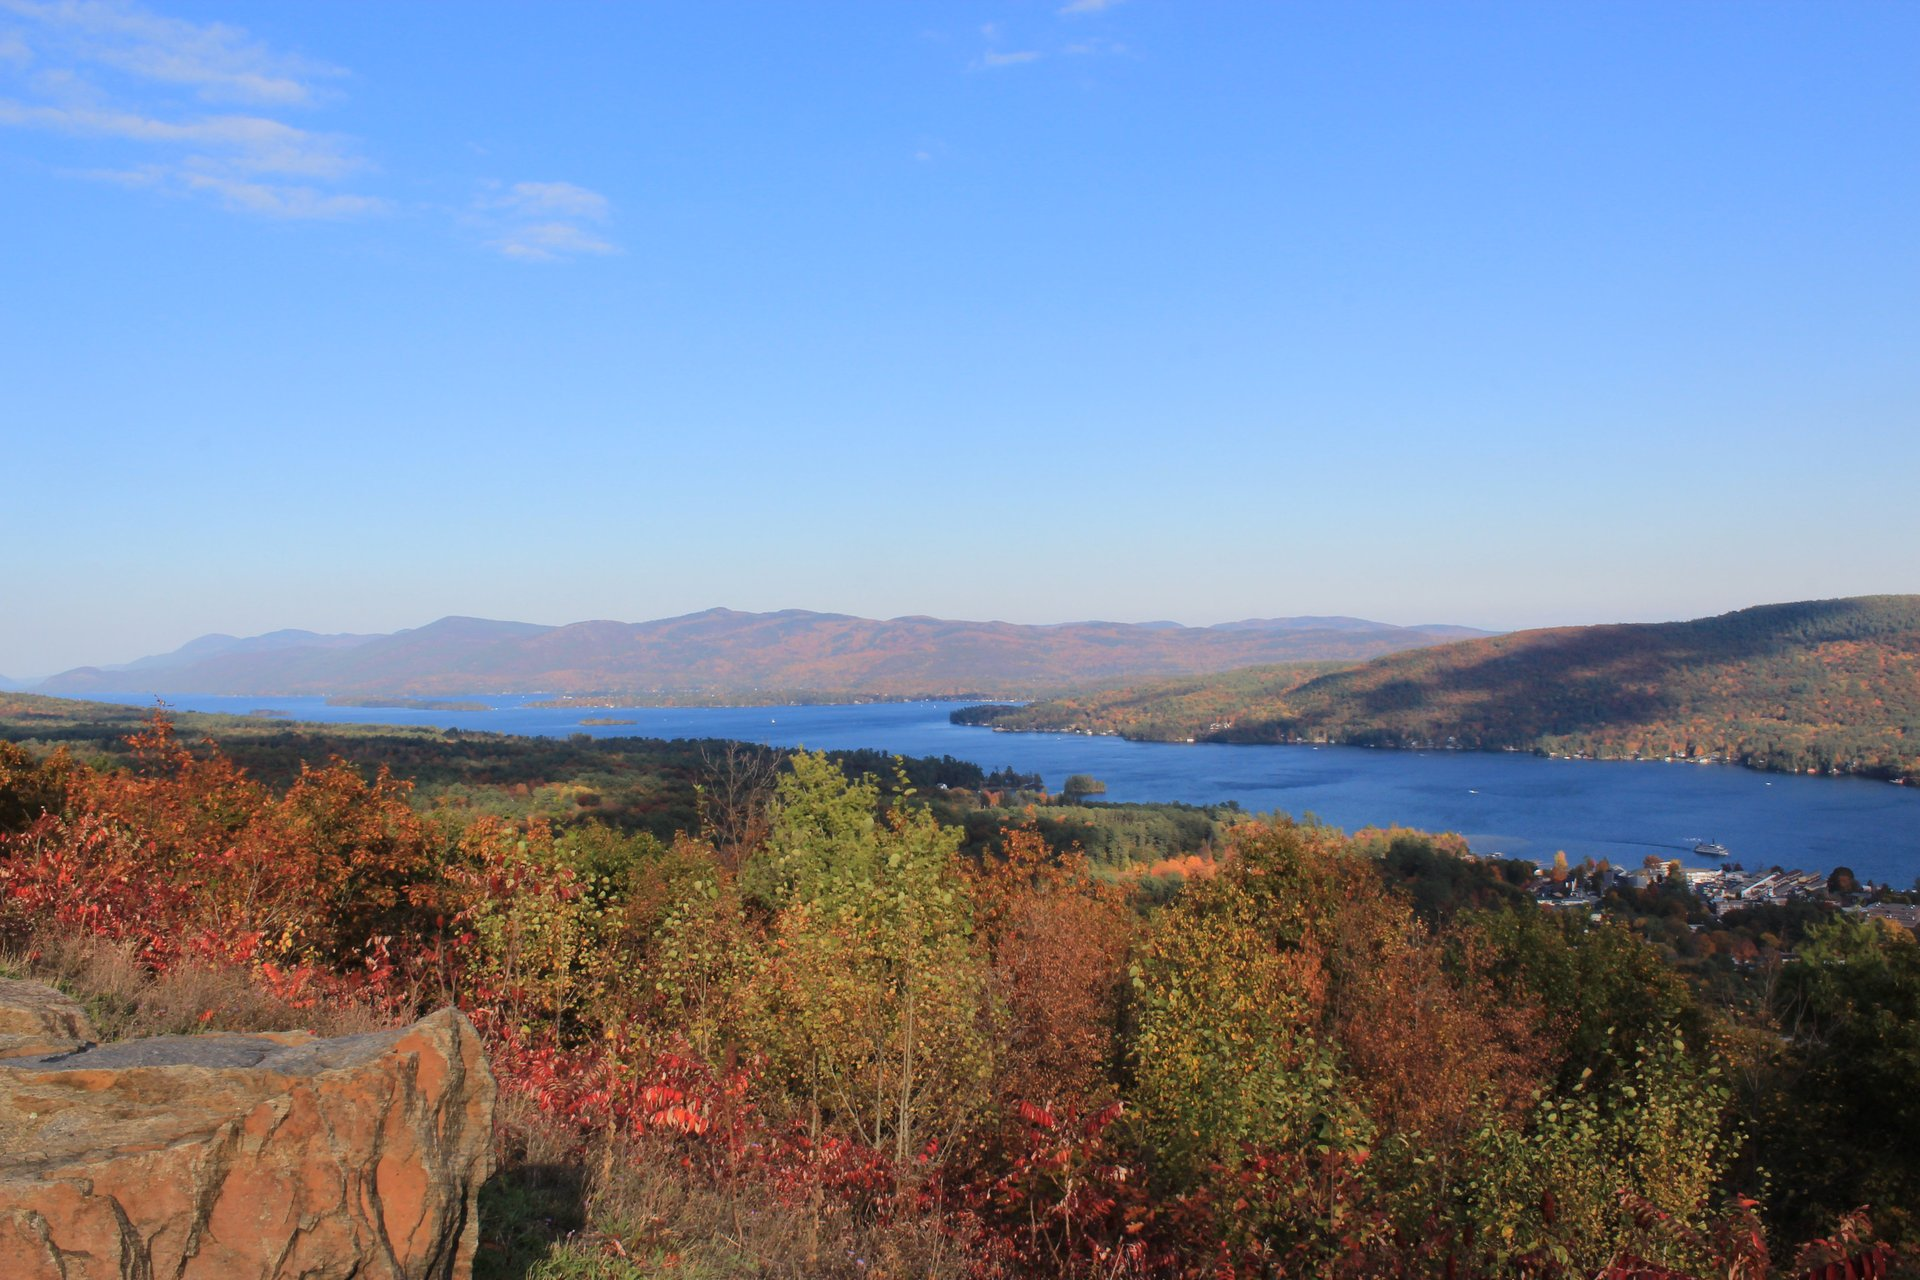 Adirondack Lakes in New York State - Best Season 2020